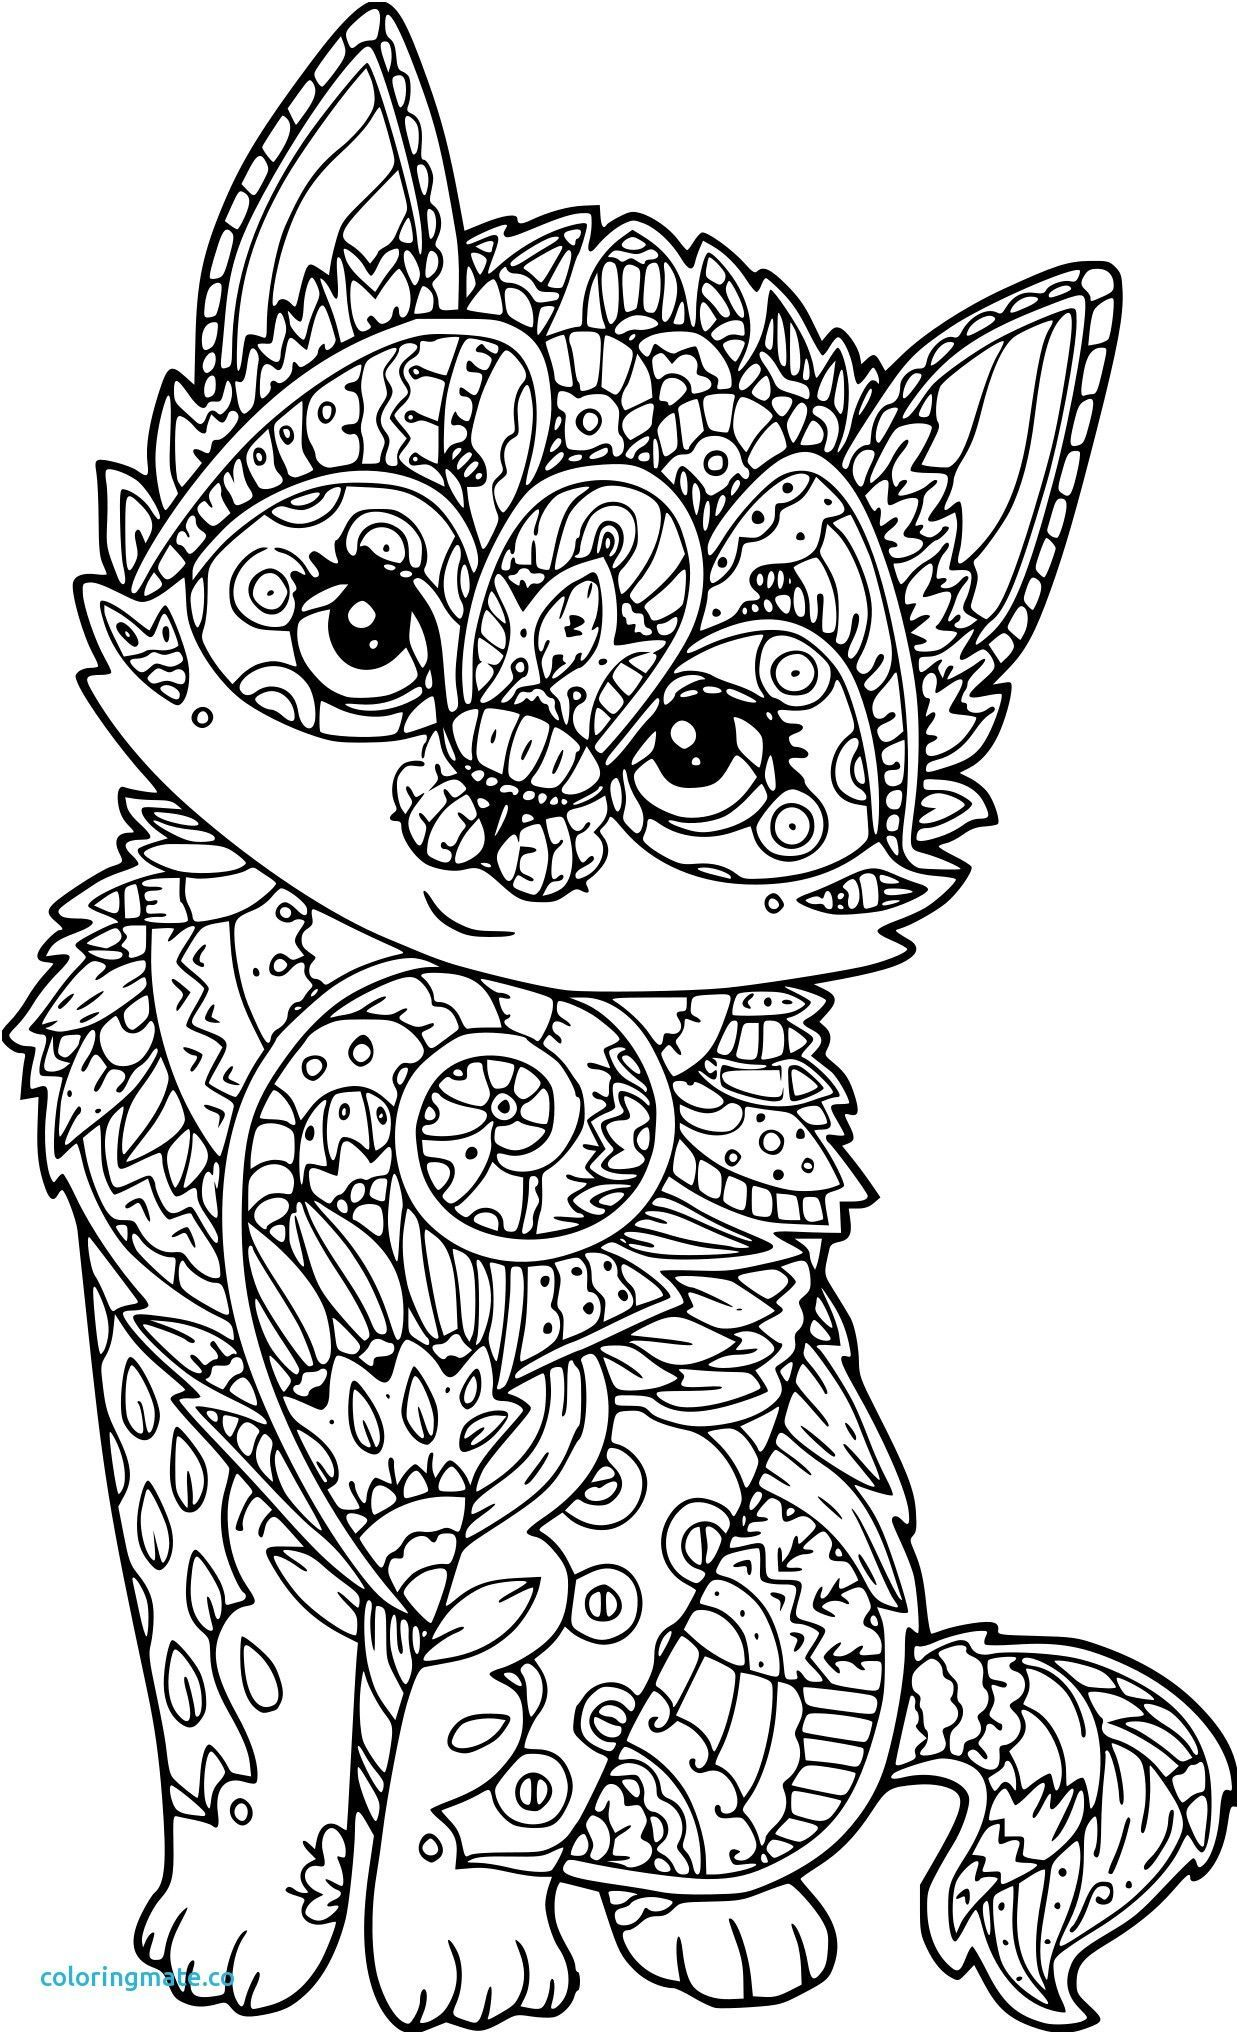 15 Précieux Imprimer Coloriage Mandala Pics | Coloriage chat, Coloriage mandala animaux ...